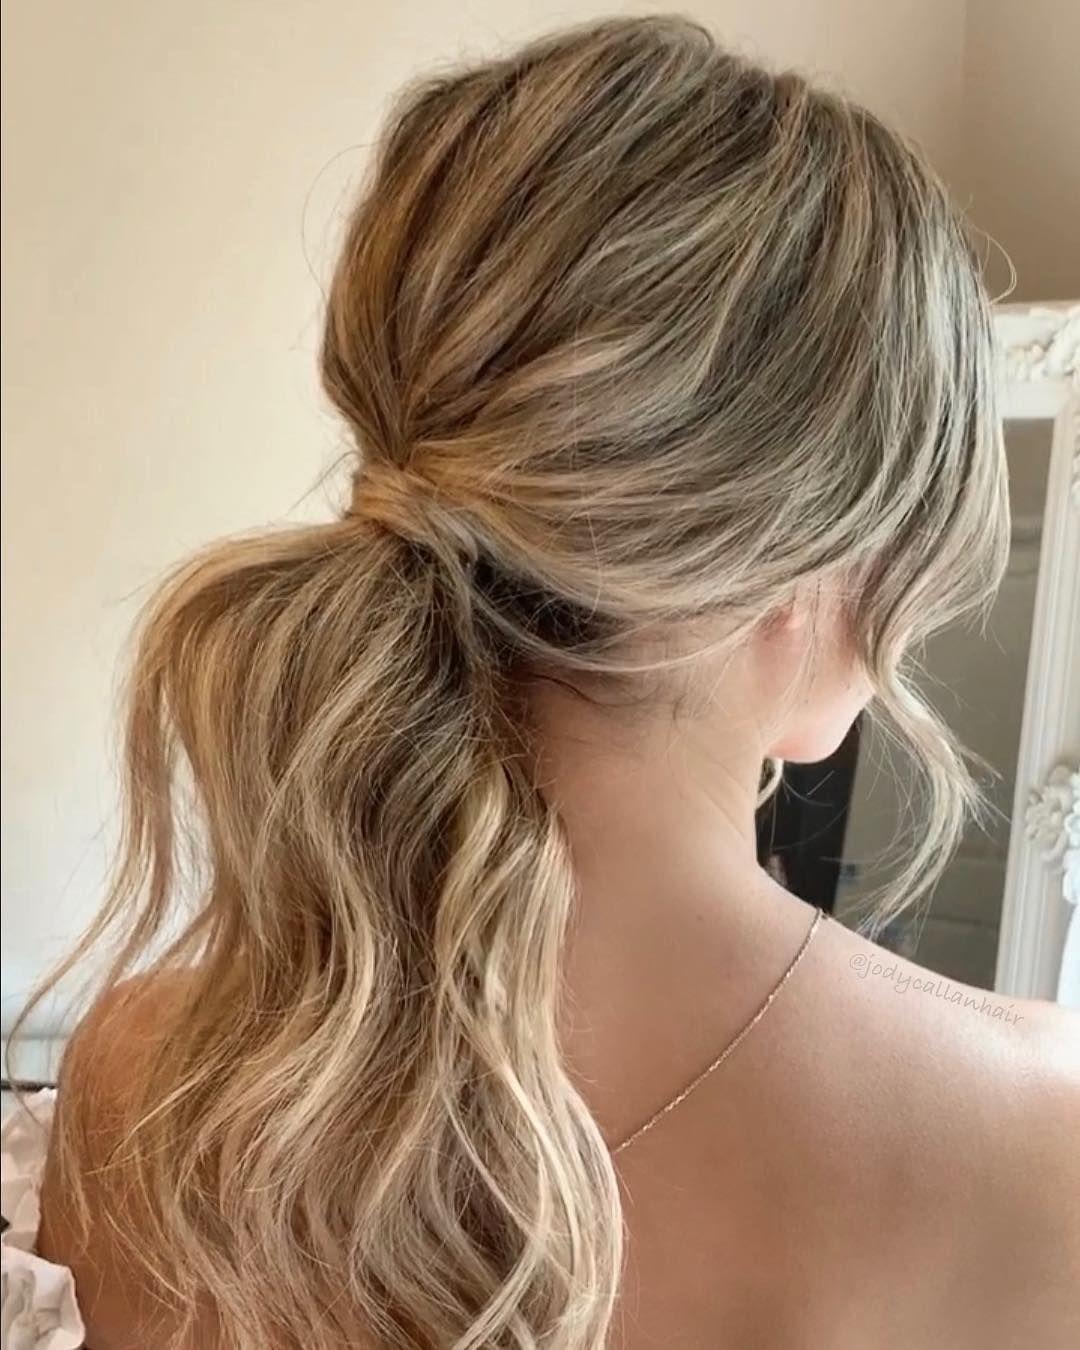 Soft Effortless Ponytail Hair Formal Hairstyles For Long Hair Prom Ponytail Hairstyles Ponytail Hairstyles